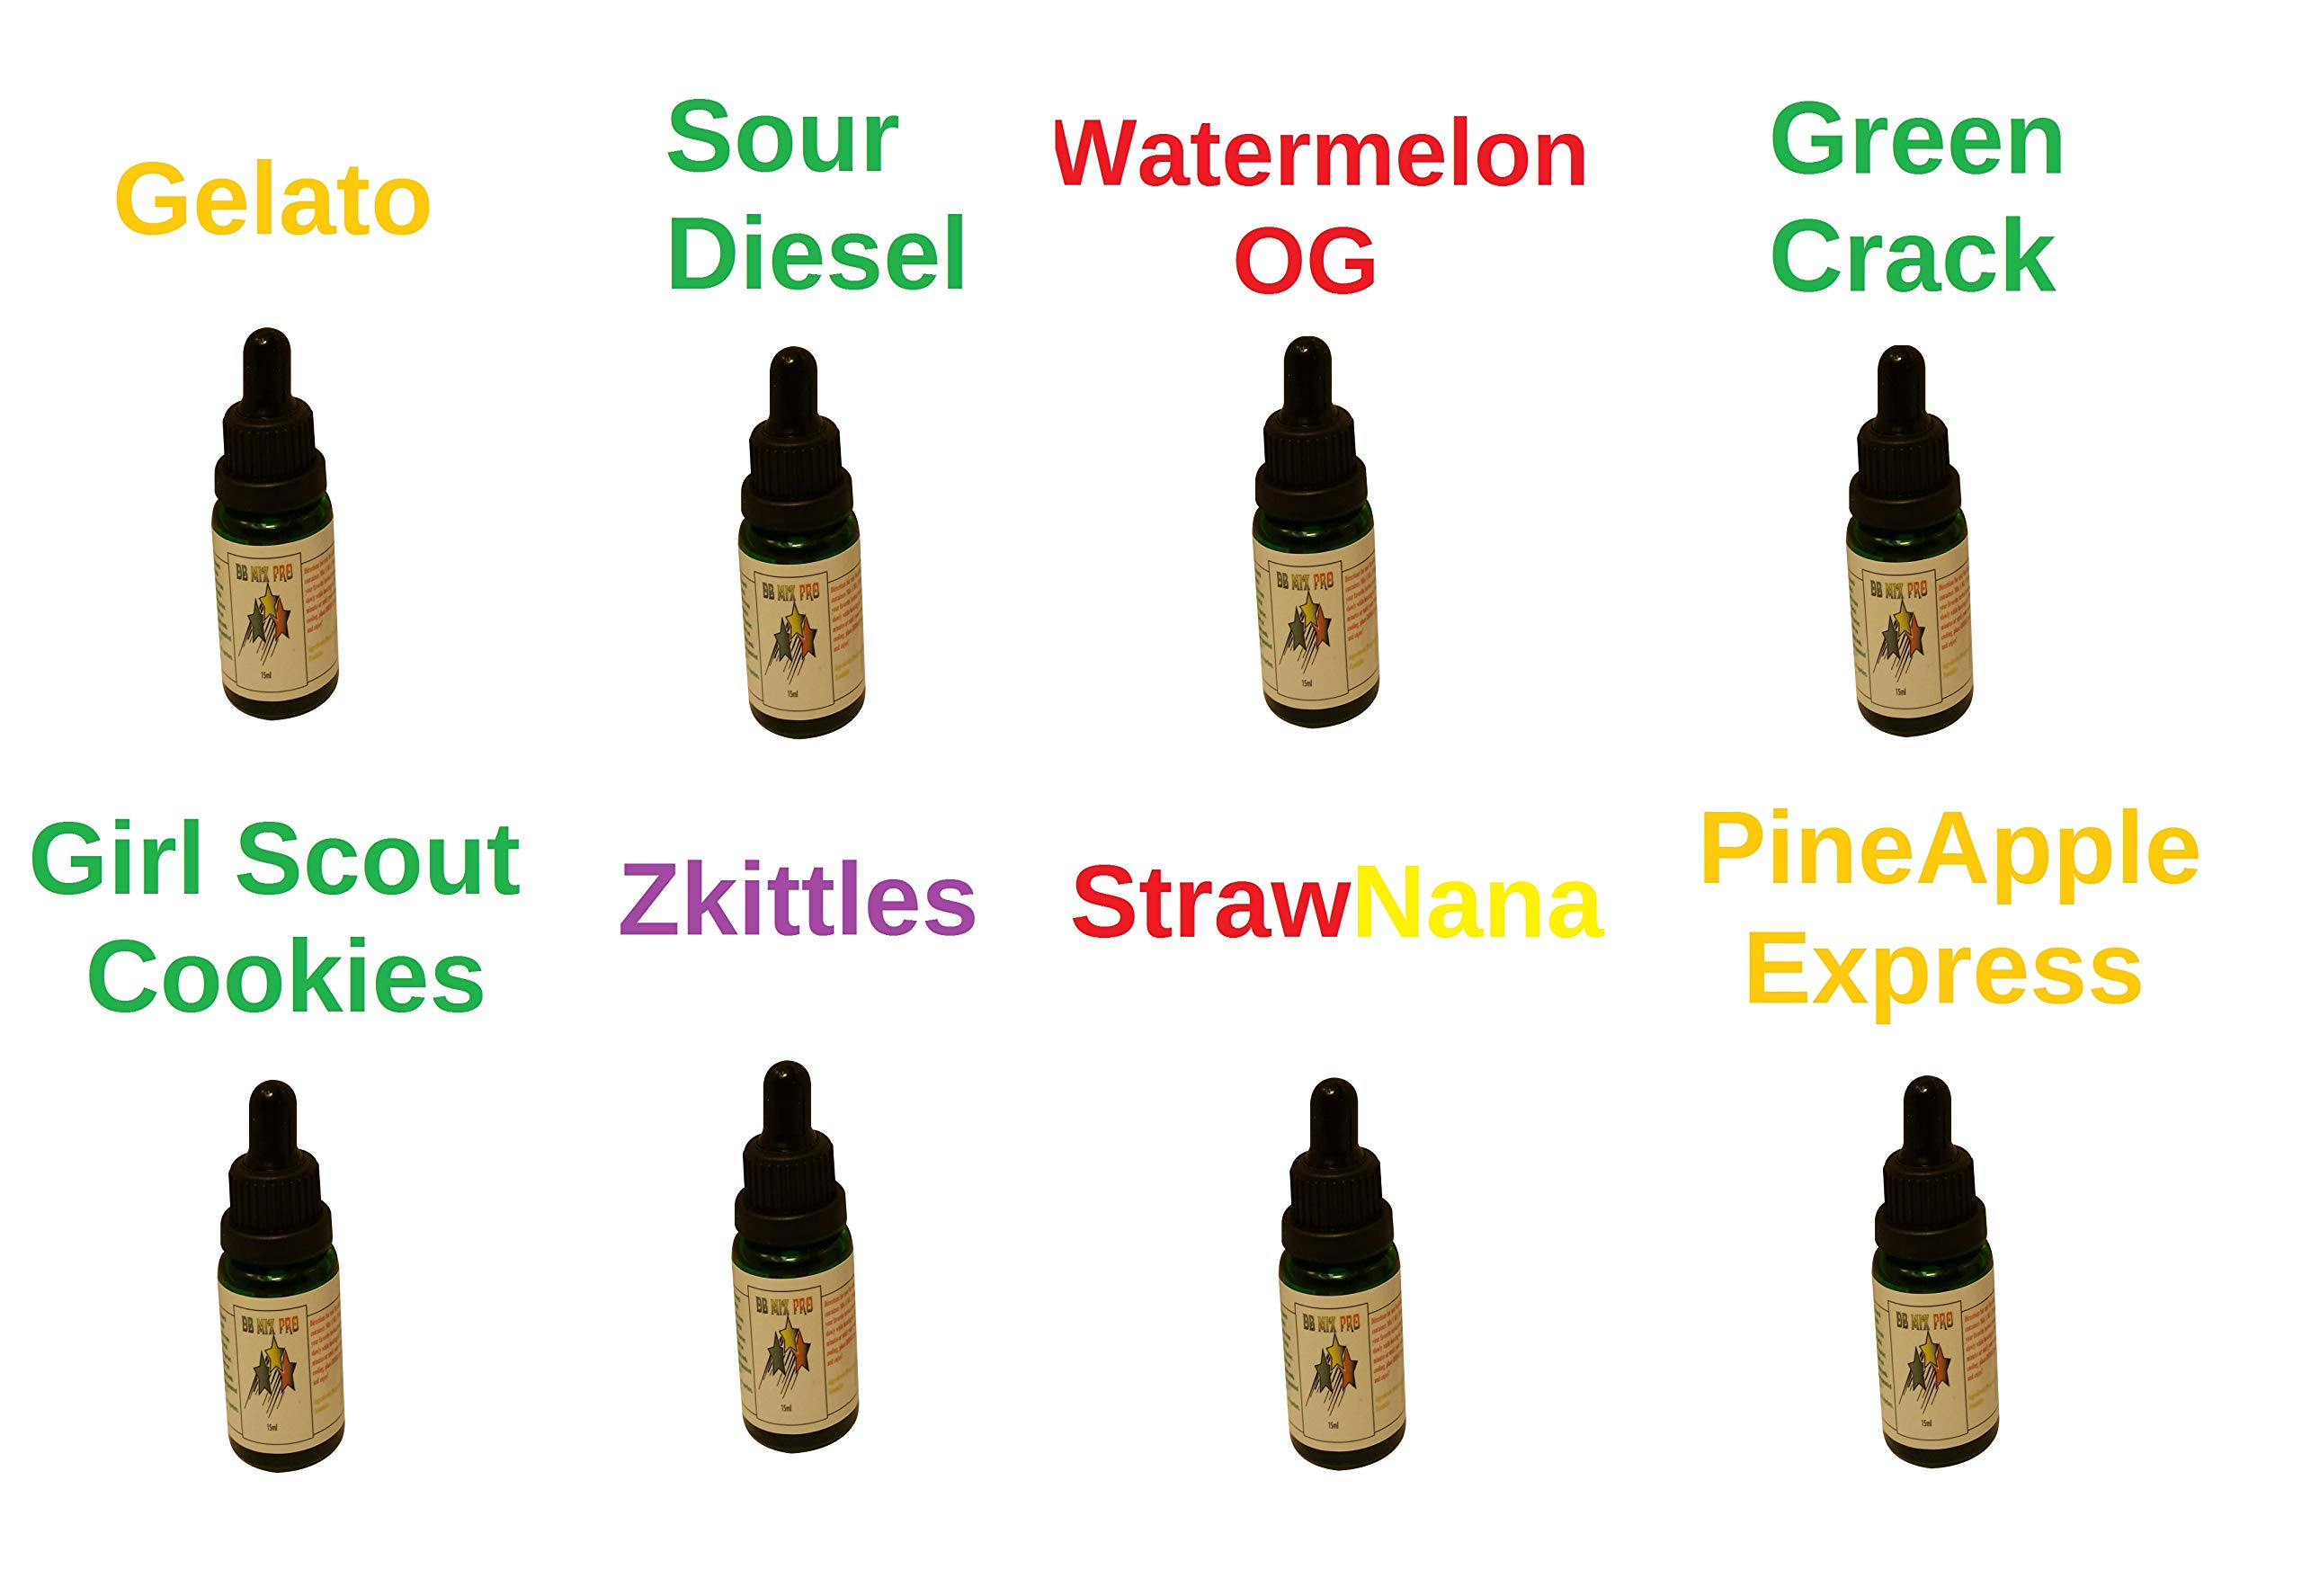 8 Pack of 15ml Bottles Terpene Infused Liquidizer 99% Pure Colorado Terpenes Strain Profiles